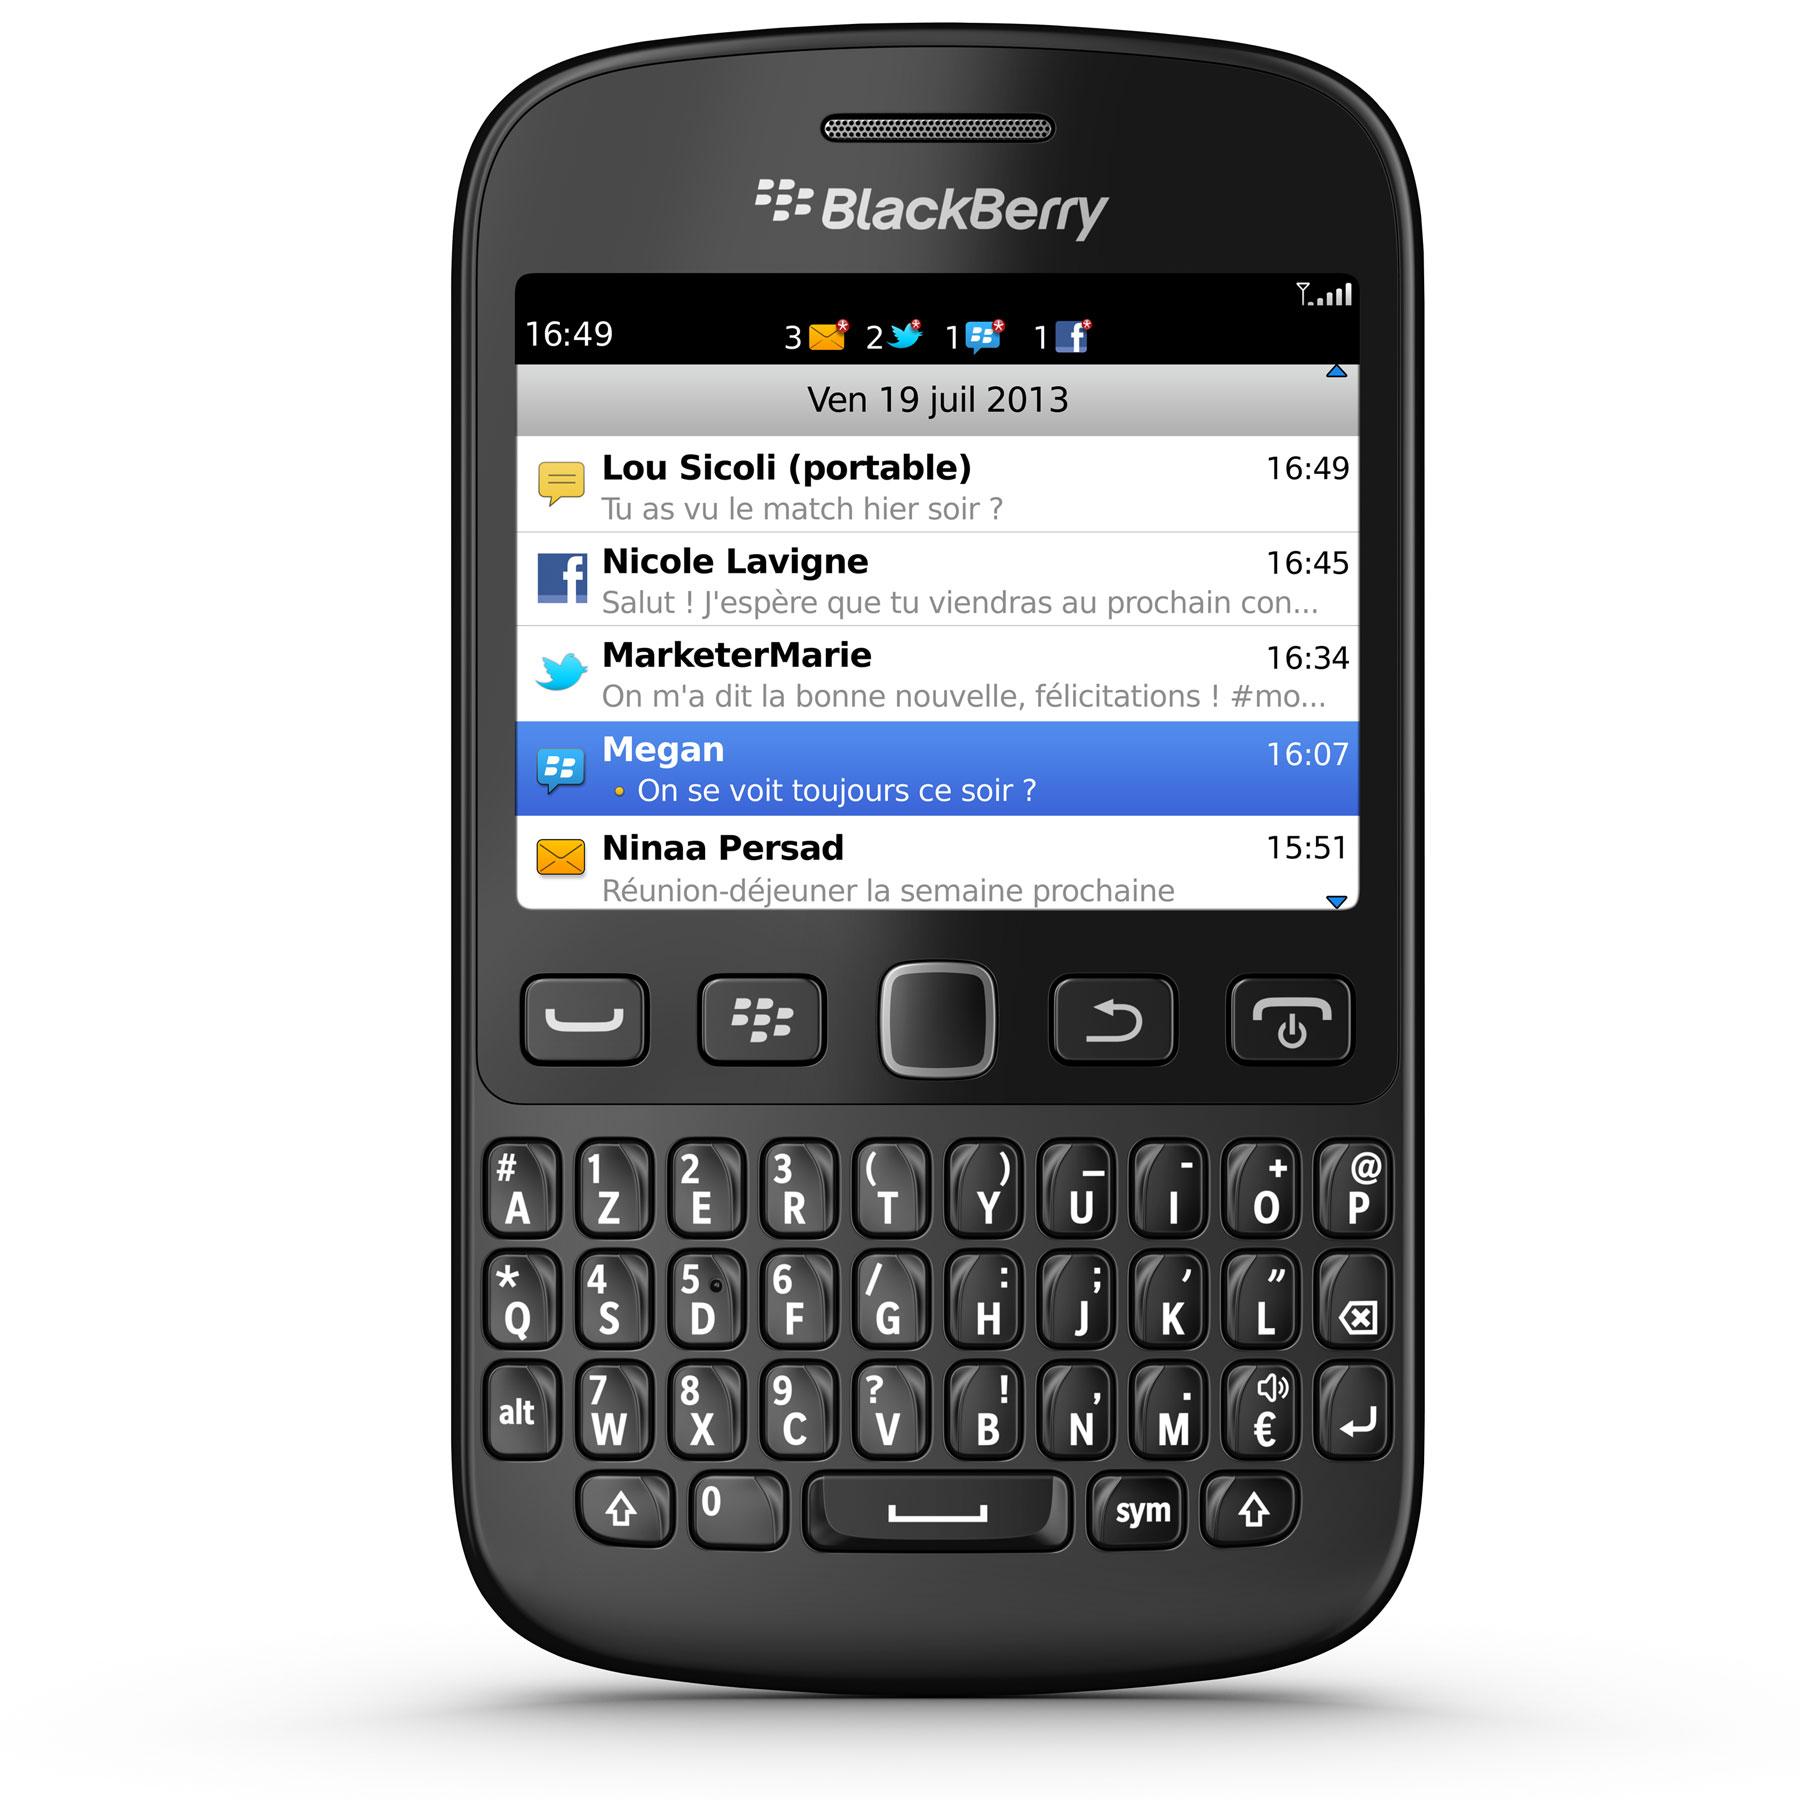 blackberry 9720 azerty noir mobile smartphone. Black Bedroom Furniture Sets. Home Design Ideas